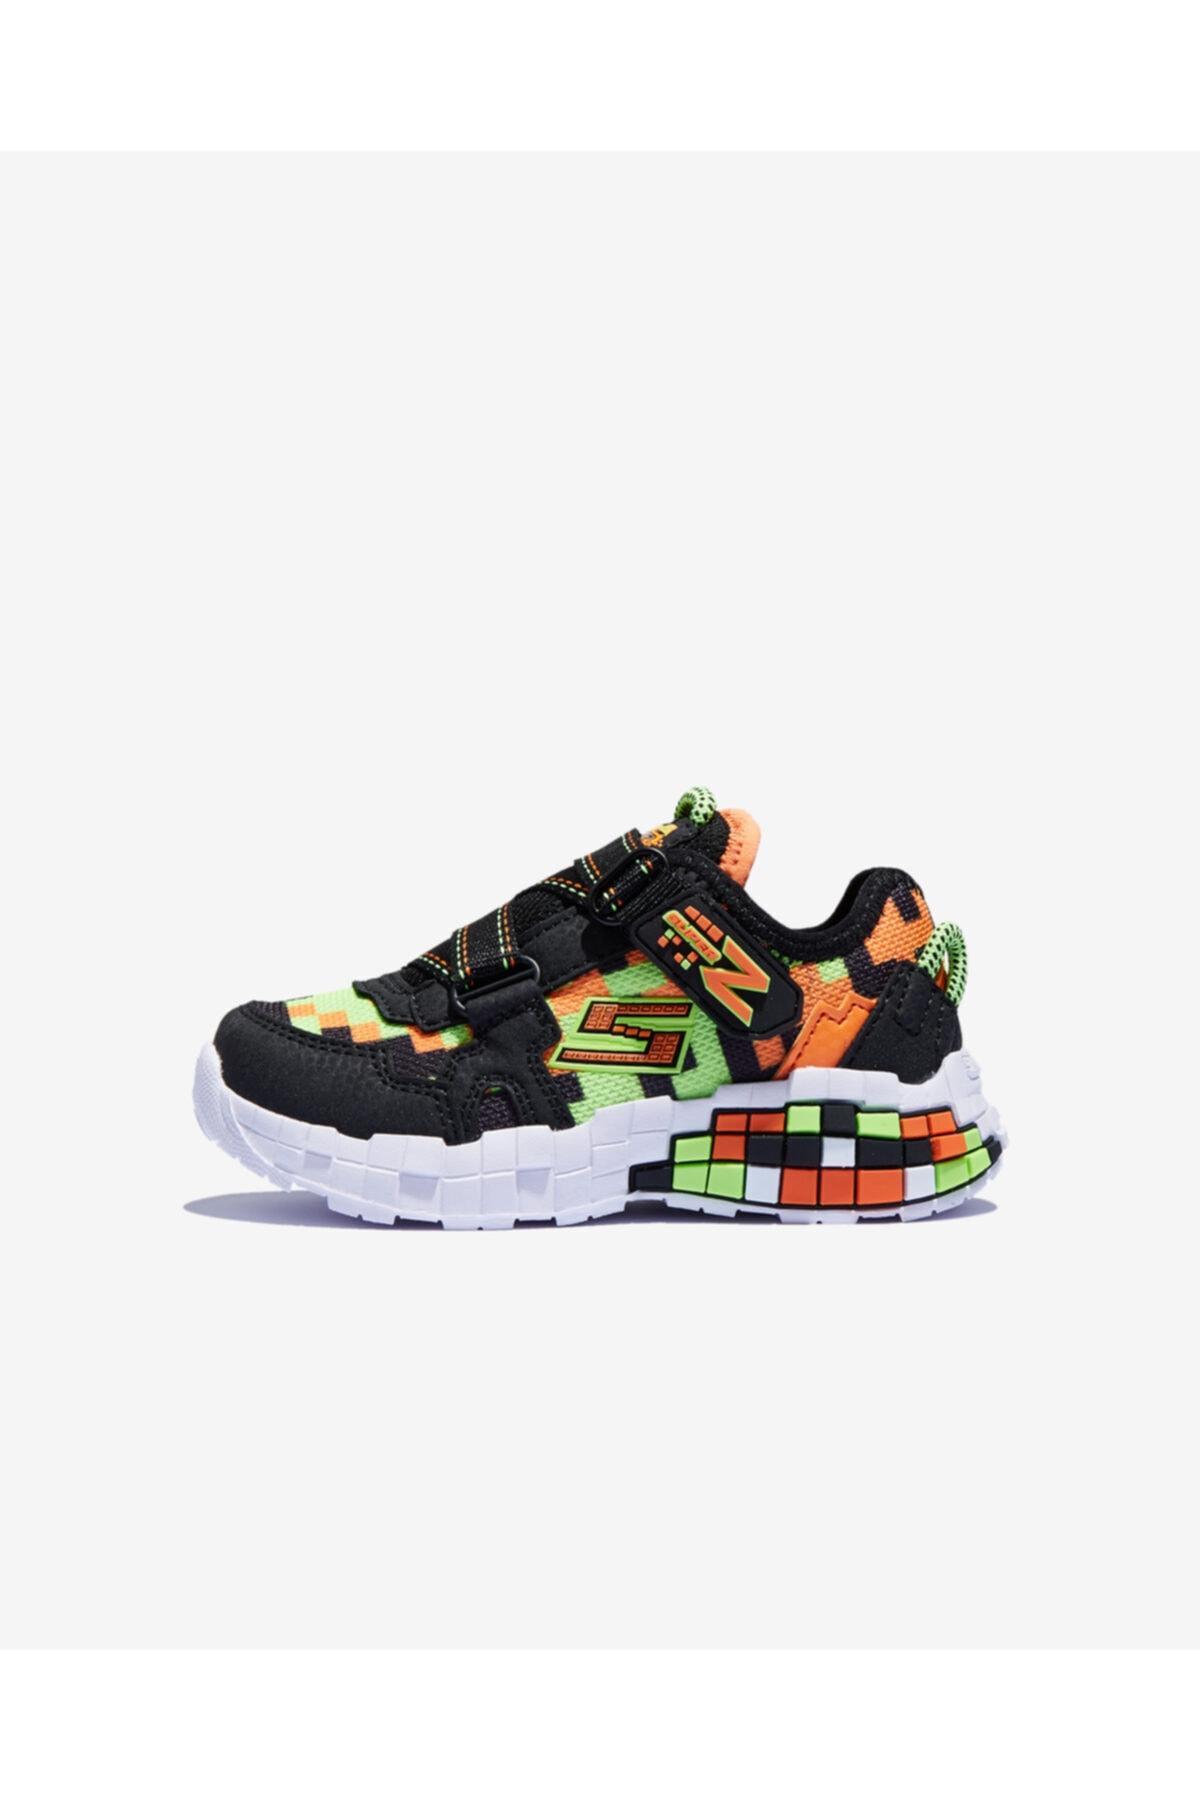 SKECHERS LIL MEGA-CRAFT Küçük Erkek Çocuk Siyah Sneakers 1